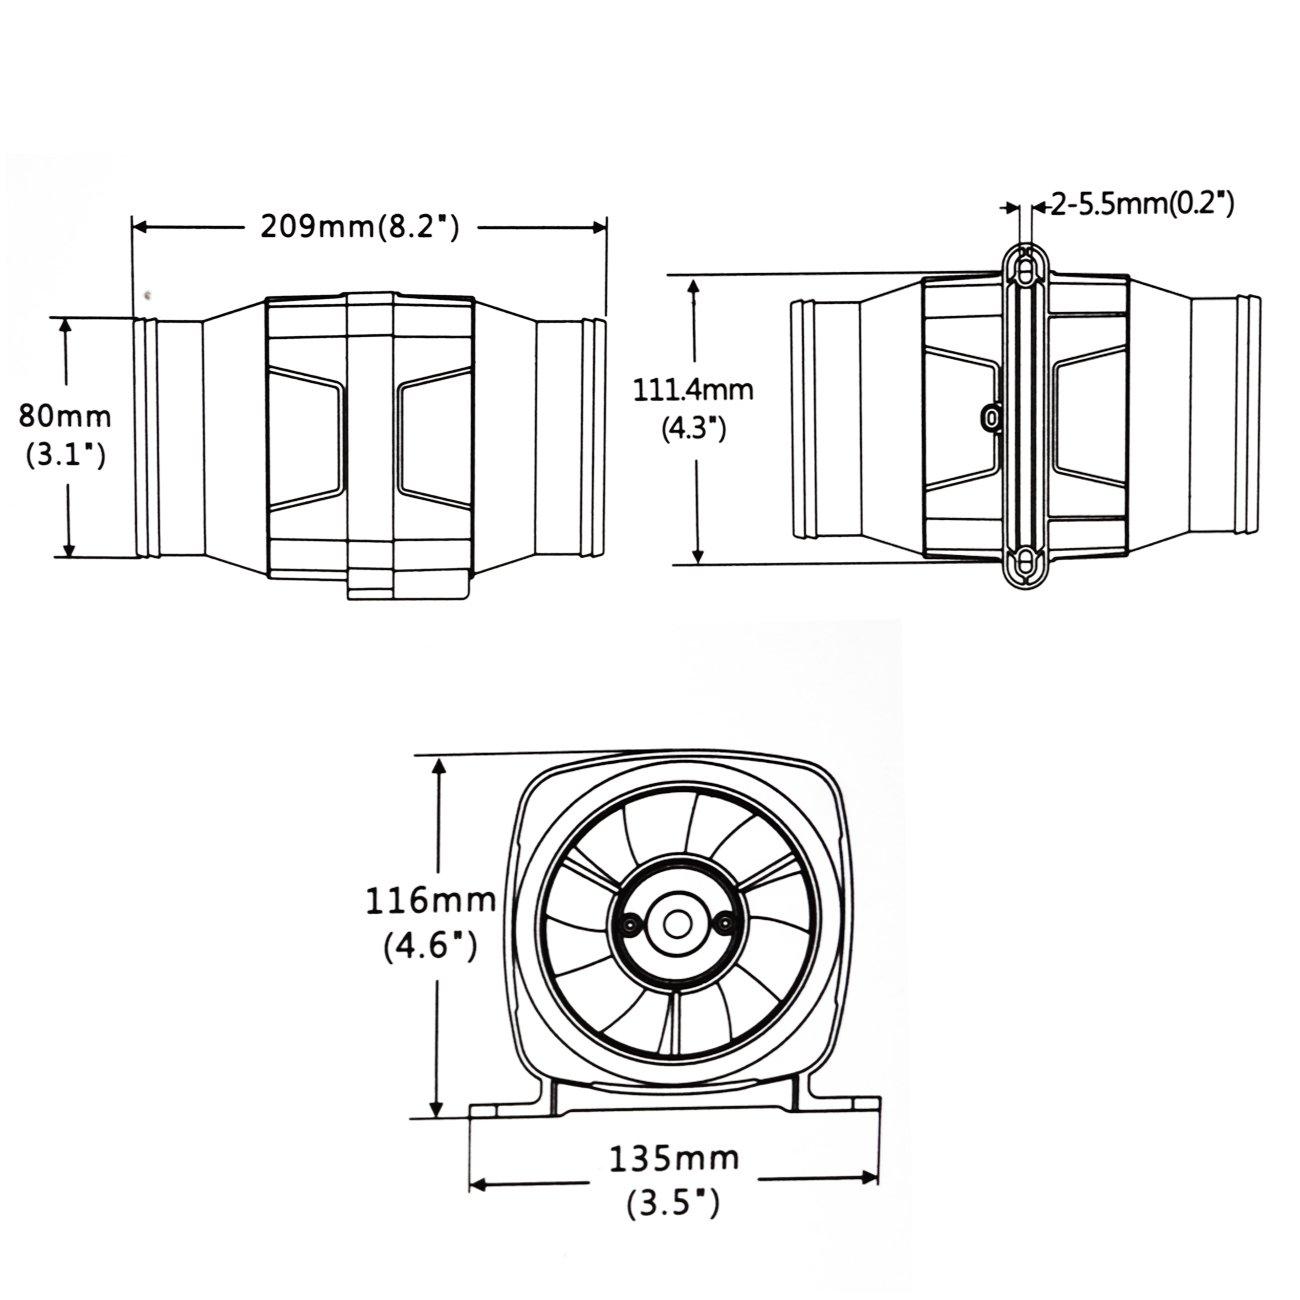 DCHOUSE 130 CFM 12 V 7,6 cm Schlauch Marine Gebl/äse Bilge Vent Fan Bel/üftung Boot Wohnmobil